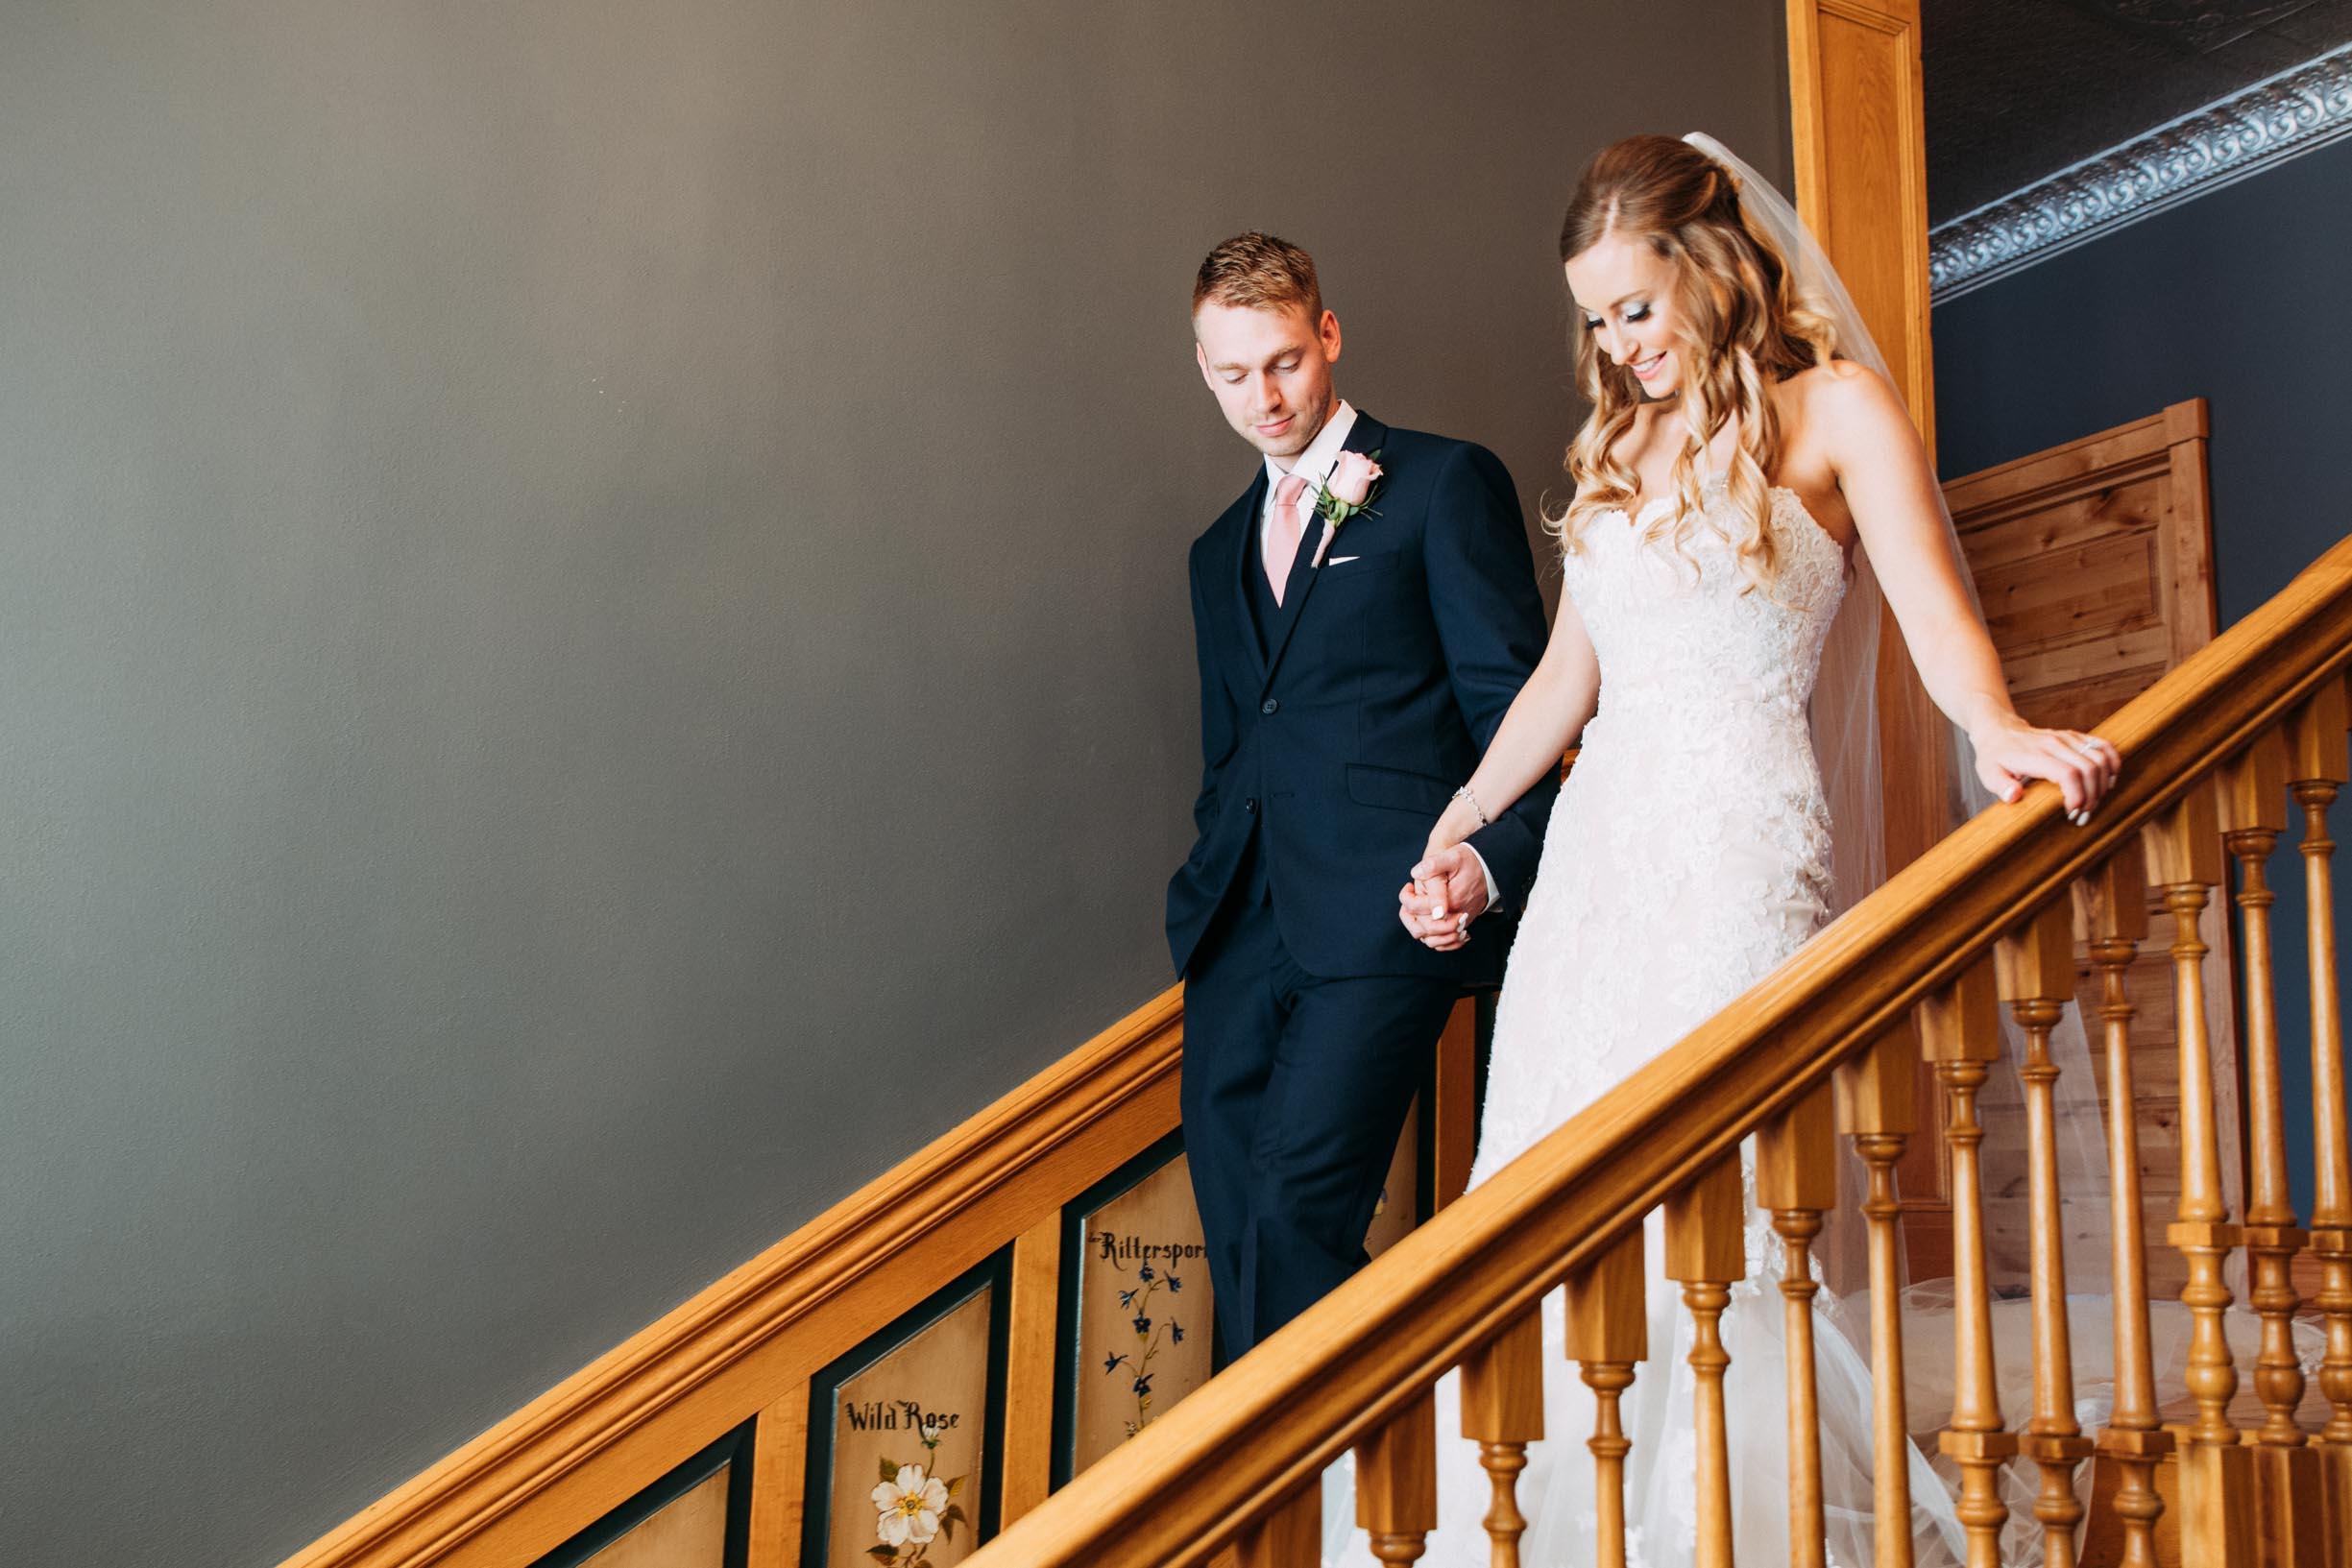 17-WeddingsattheBroz_Minnesota_WeddingBlog.jpg